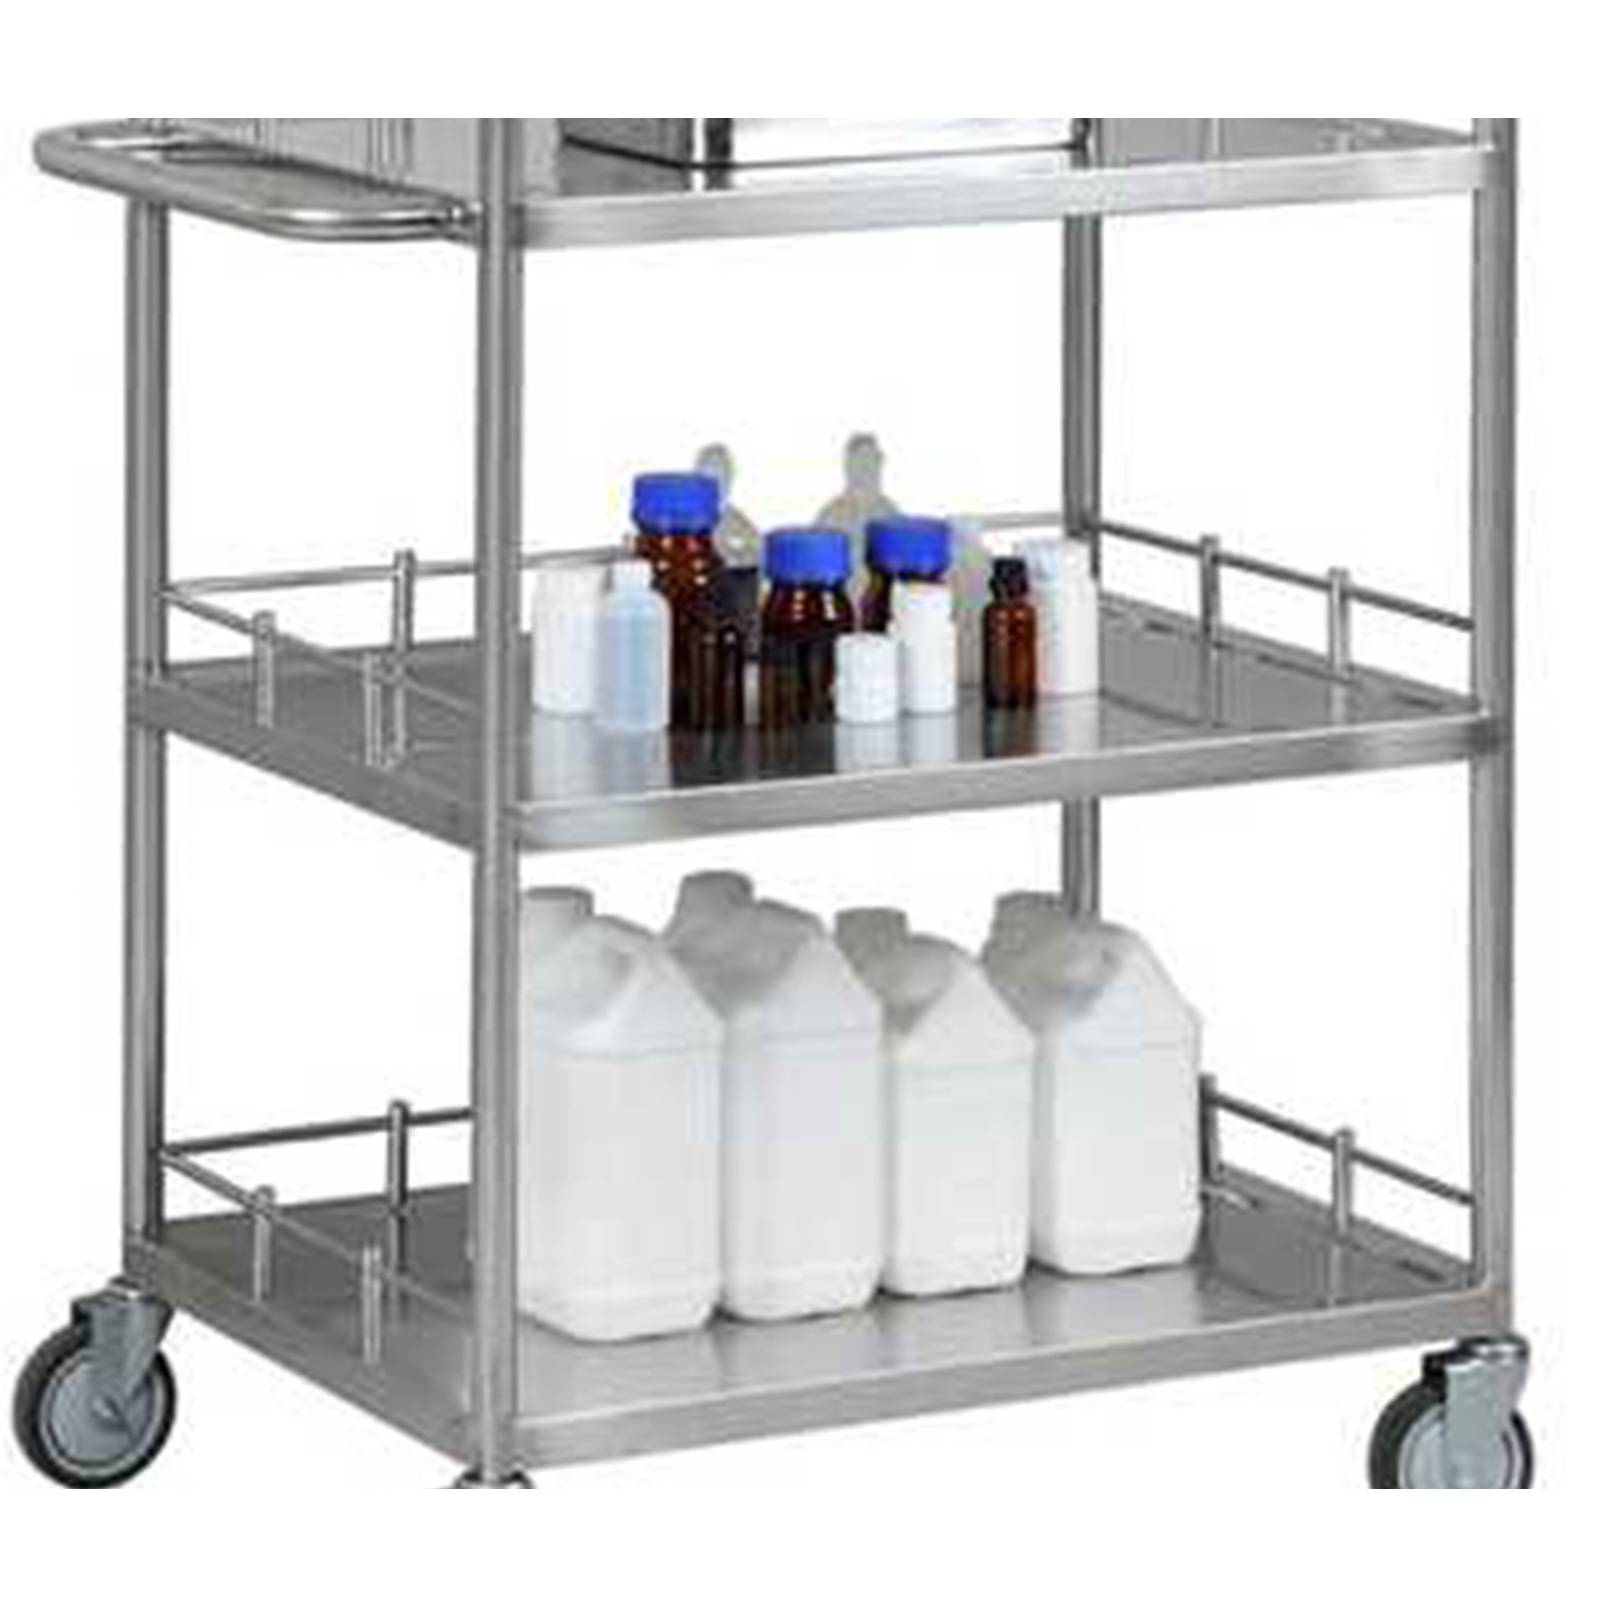 thumbnail 60 - Rolling Storage Cart Medical Salon Trolley Pedestal Rolling Cart Stainless Steel